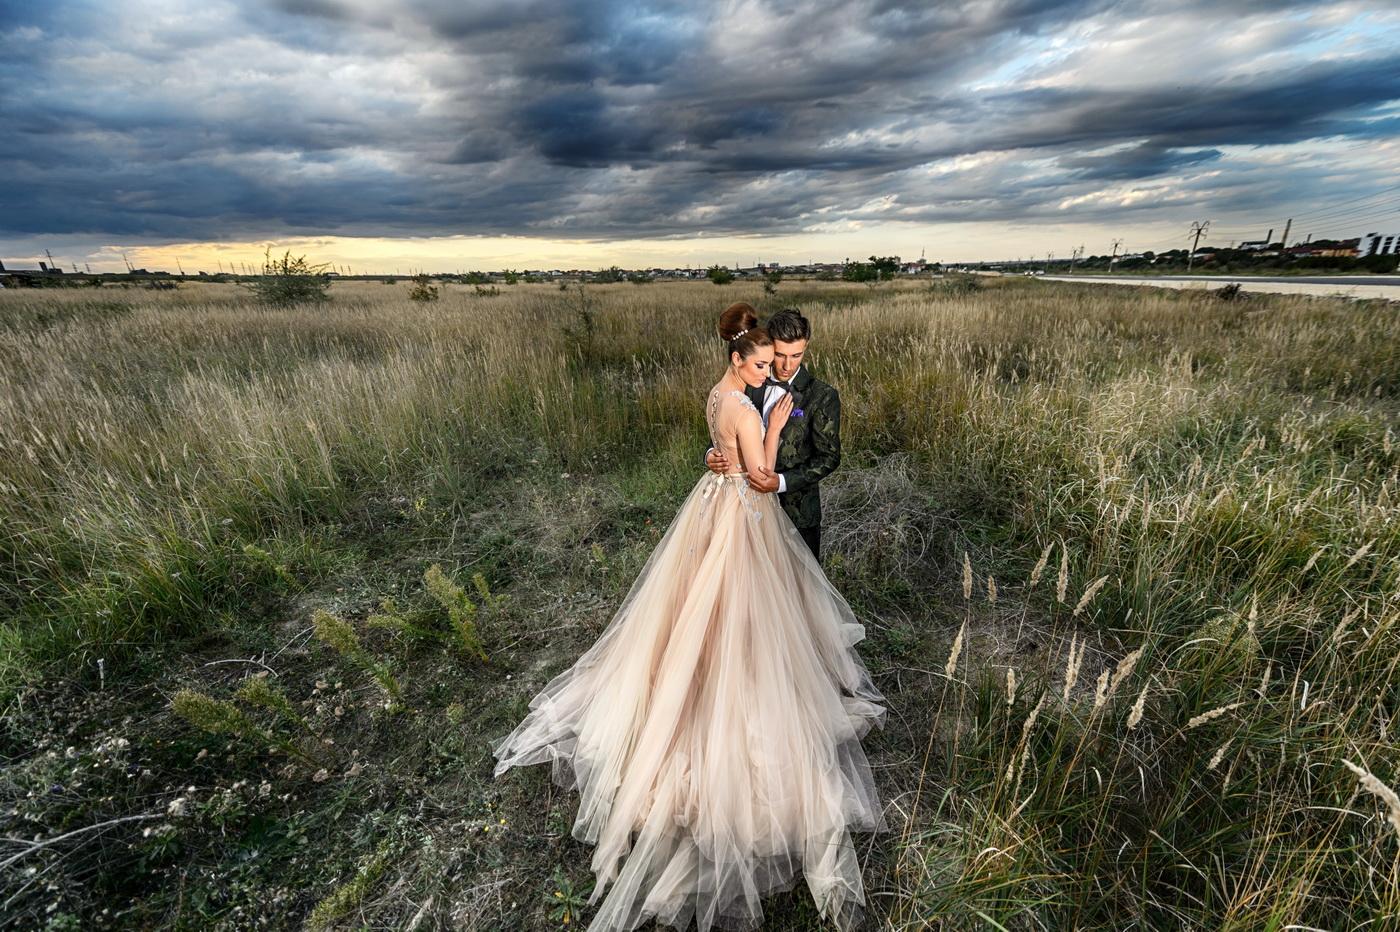 Destination Wedding Photographer_Marian Sterea_102.jpg